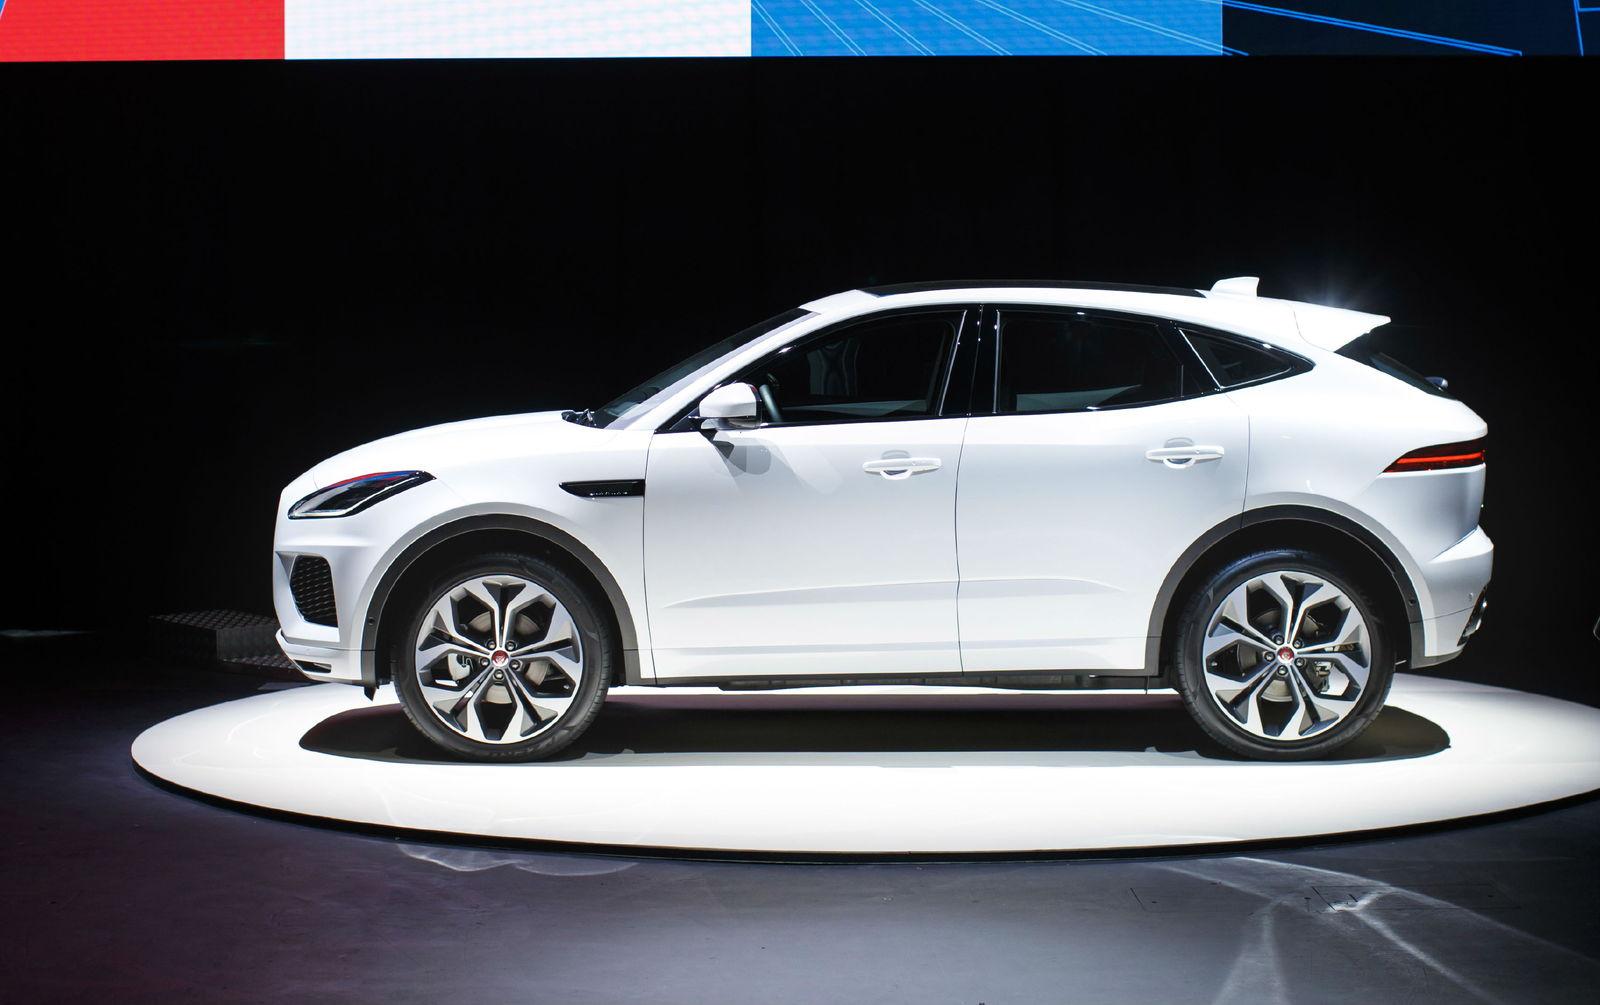 2018 jaguar e pace deals prices incentives leases overview carsdirect. Black Bedroom Furniture Sets. Home Design Ideas